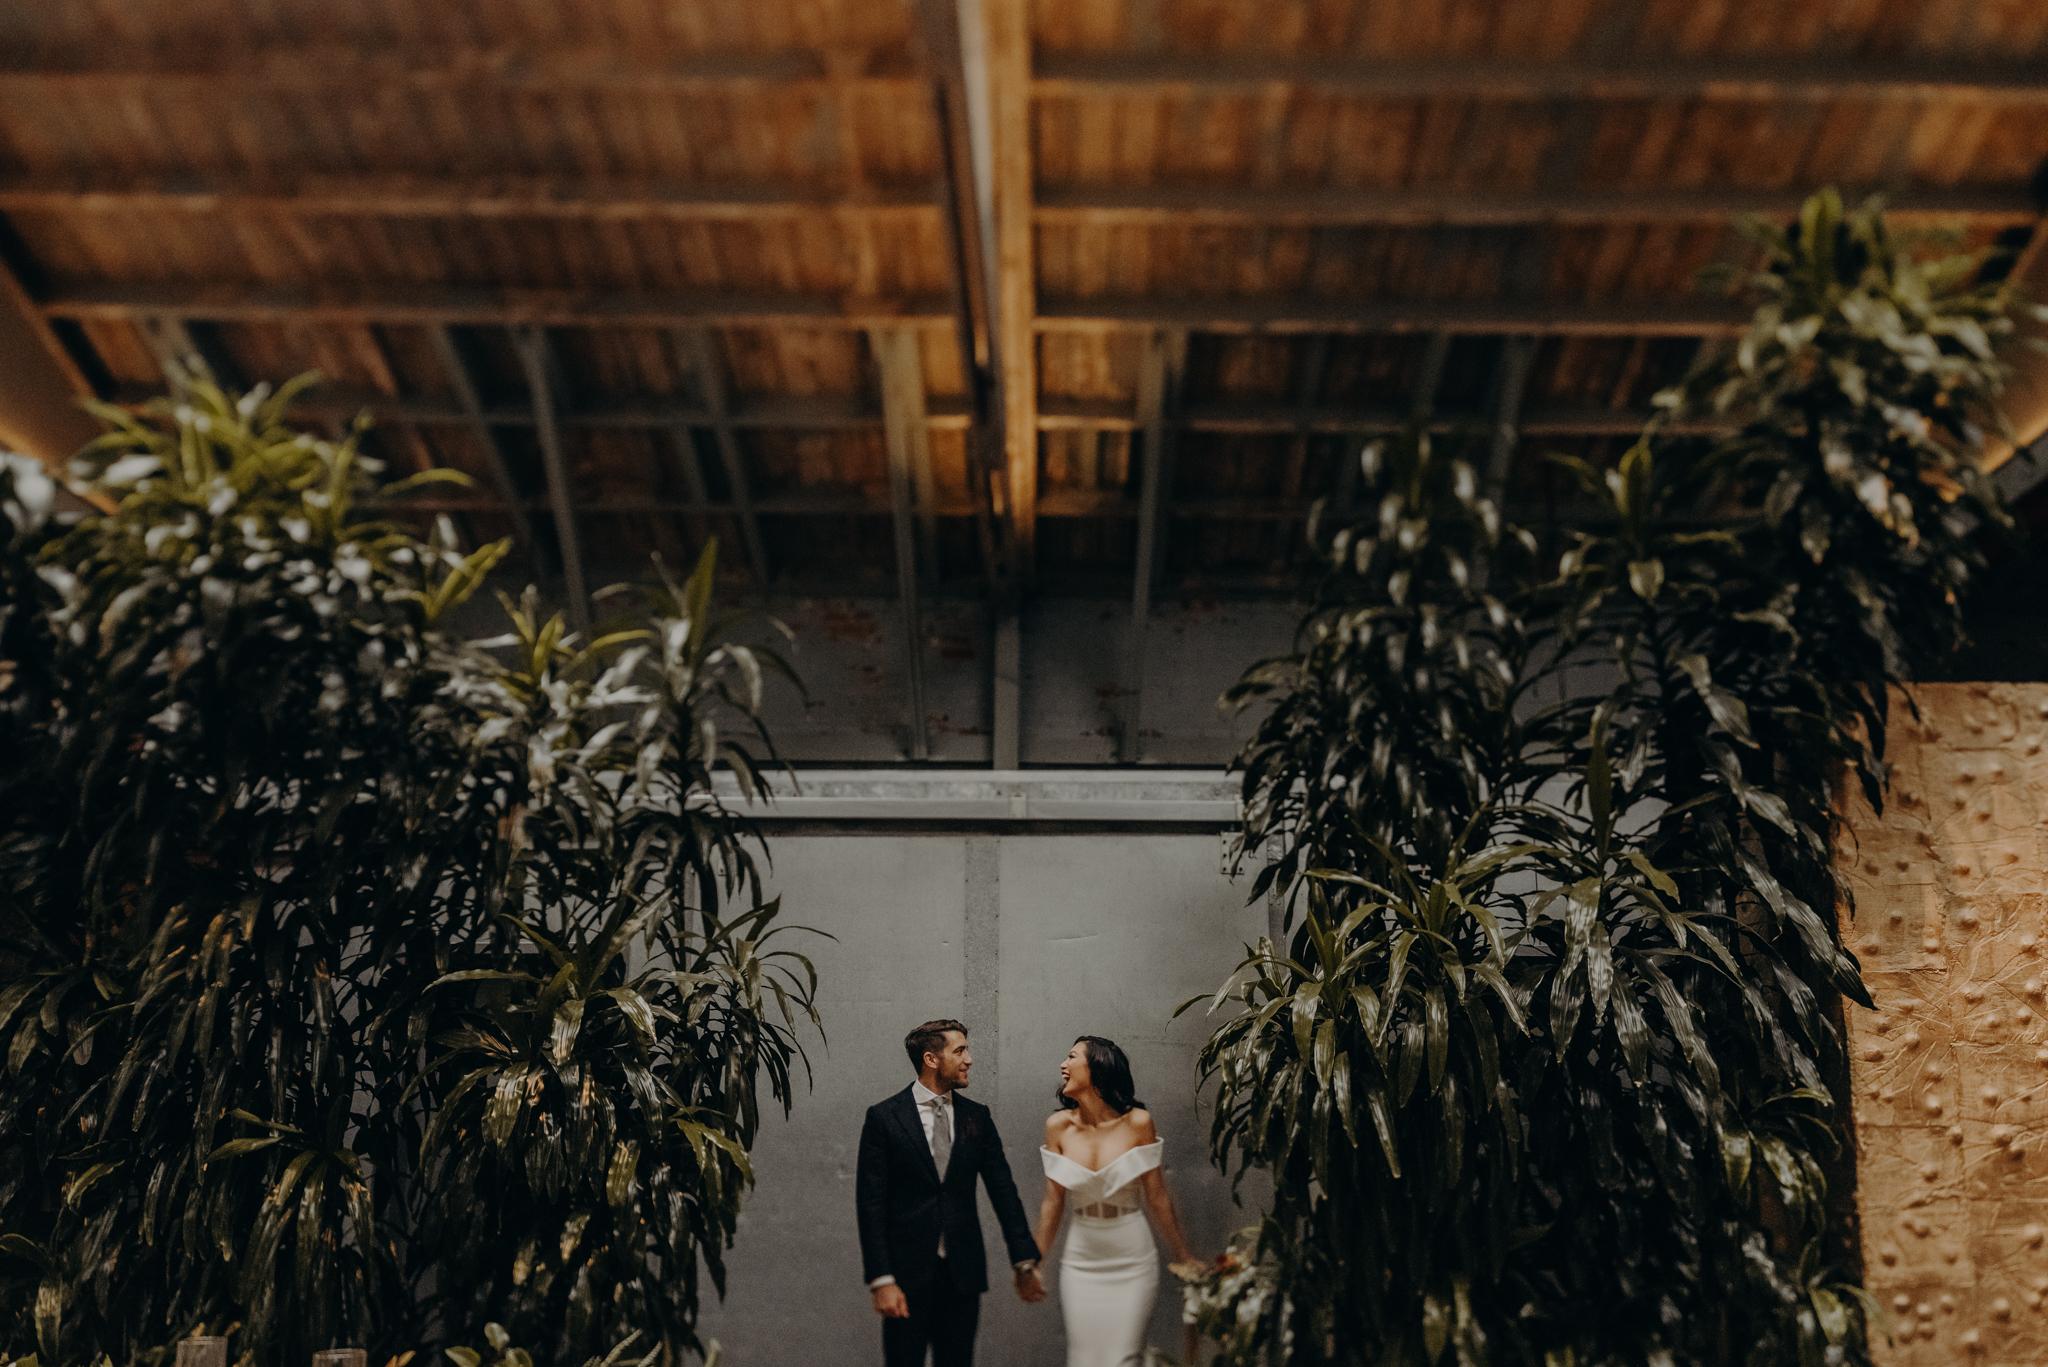 la - los angeles wedding photographer - wedding photographer in long beach - LGBTQ wedding photographer - isaiahandtaylor.com -